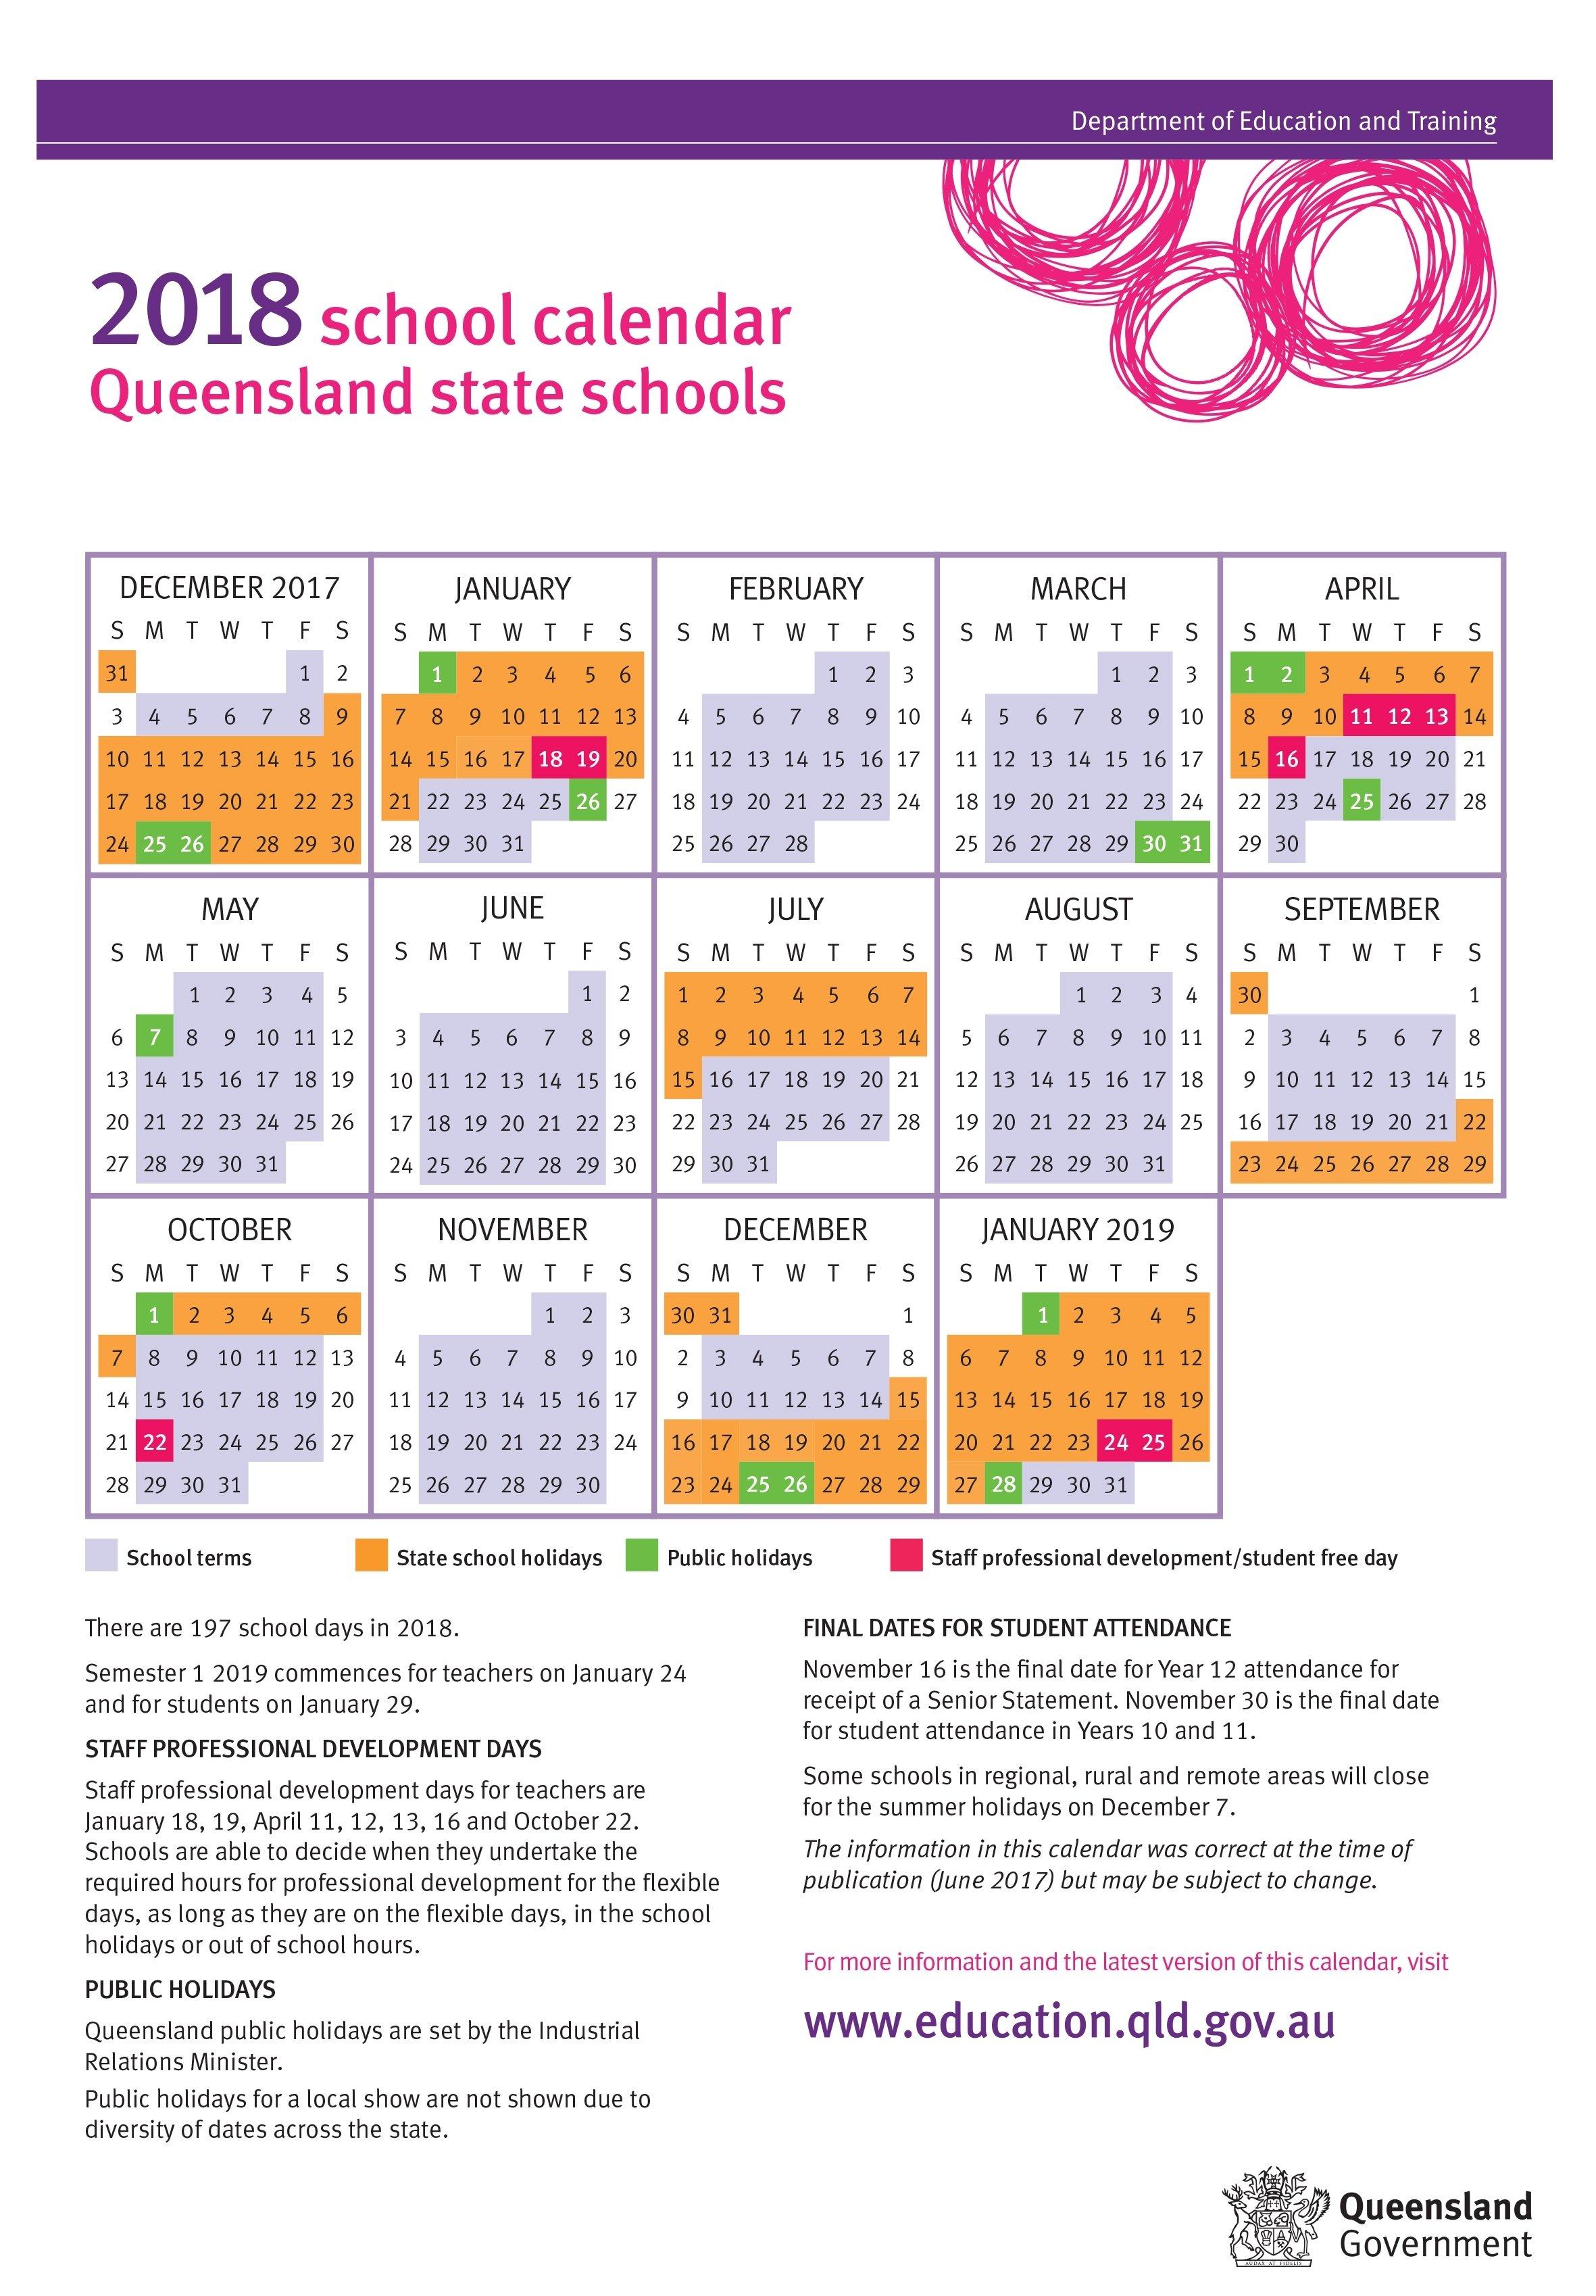 Free Yearly Calendar 2019 Singapore. School Holidays 2019 Nz. School 2019 Calendar Queensland State Schools